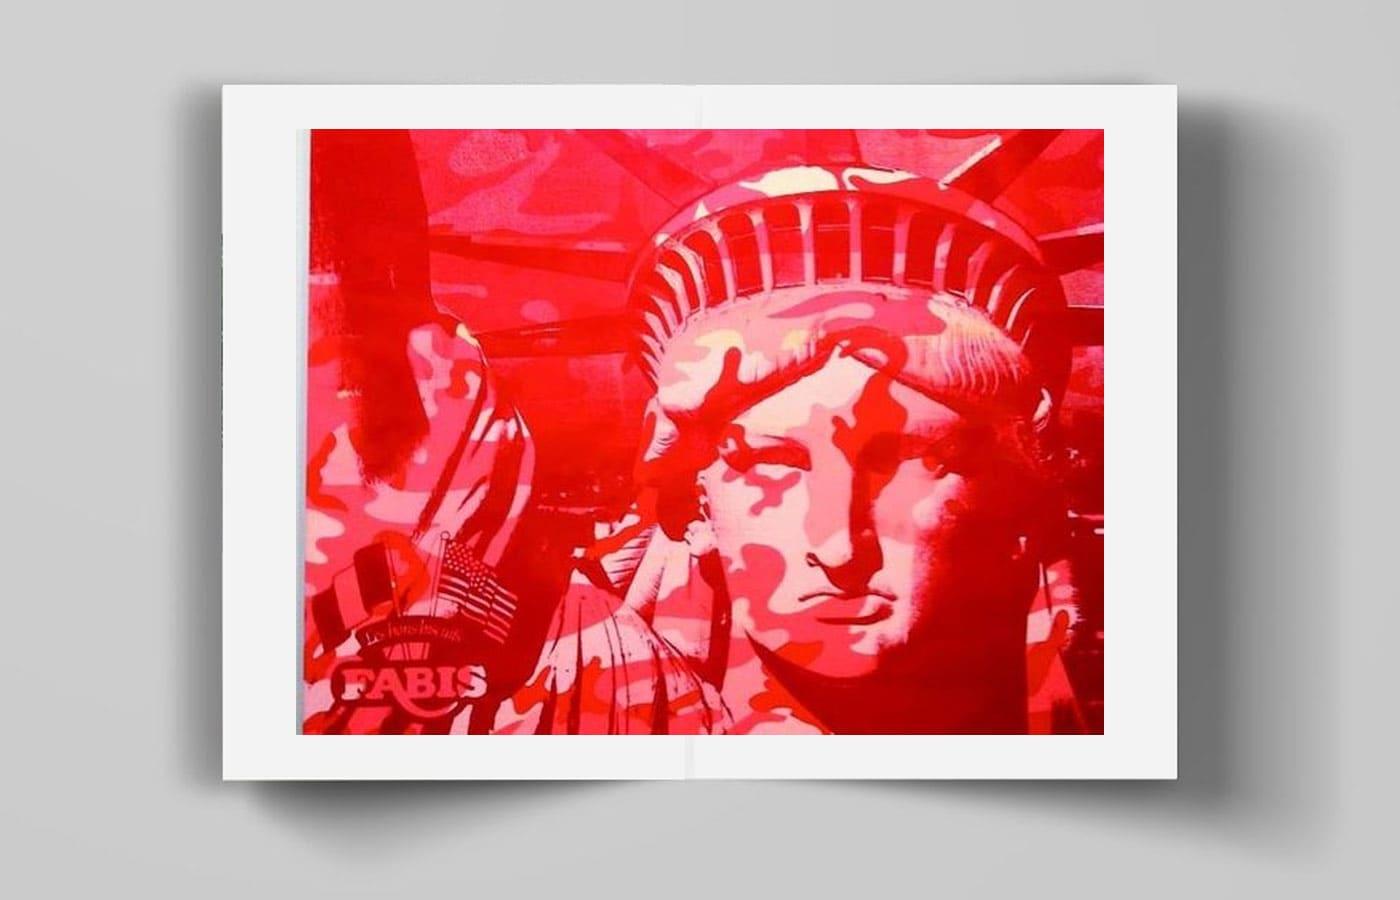 Andy Warhol 12 - اندی وارهول Andy Warhol